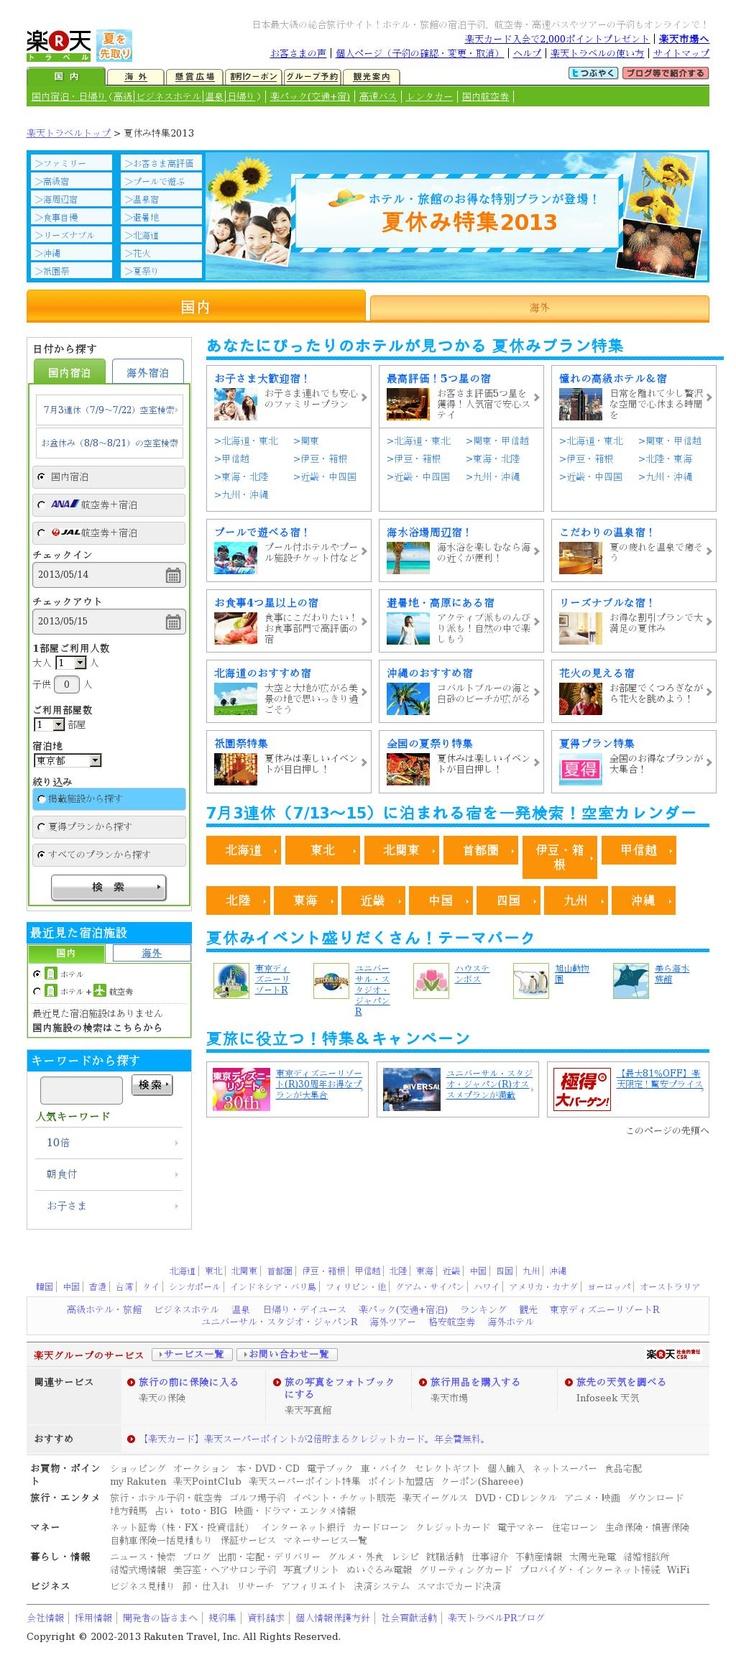 夏休み特集2013  http://travel.rakuten.co.jp/special/summer/